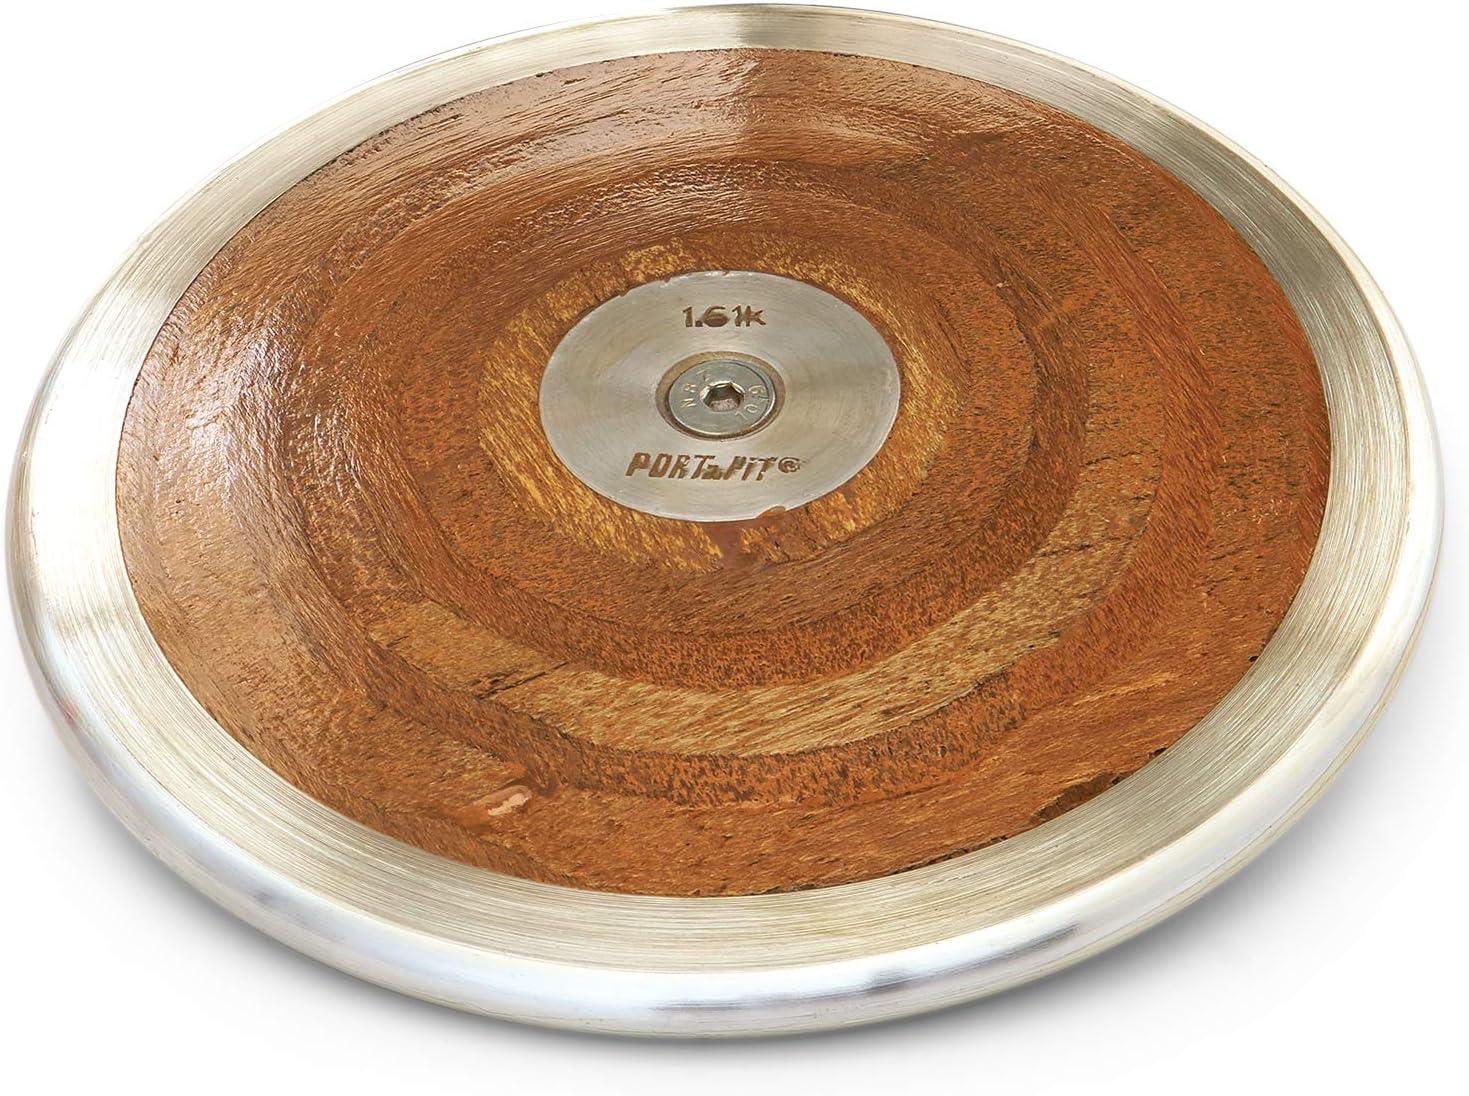 Wood Bargain sale Discus New item 1.6kg